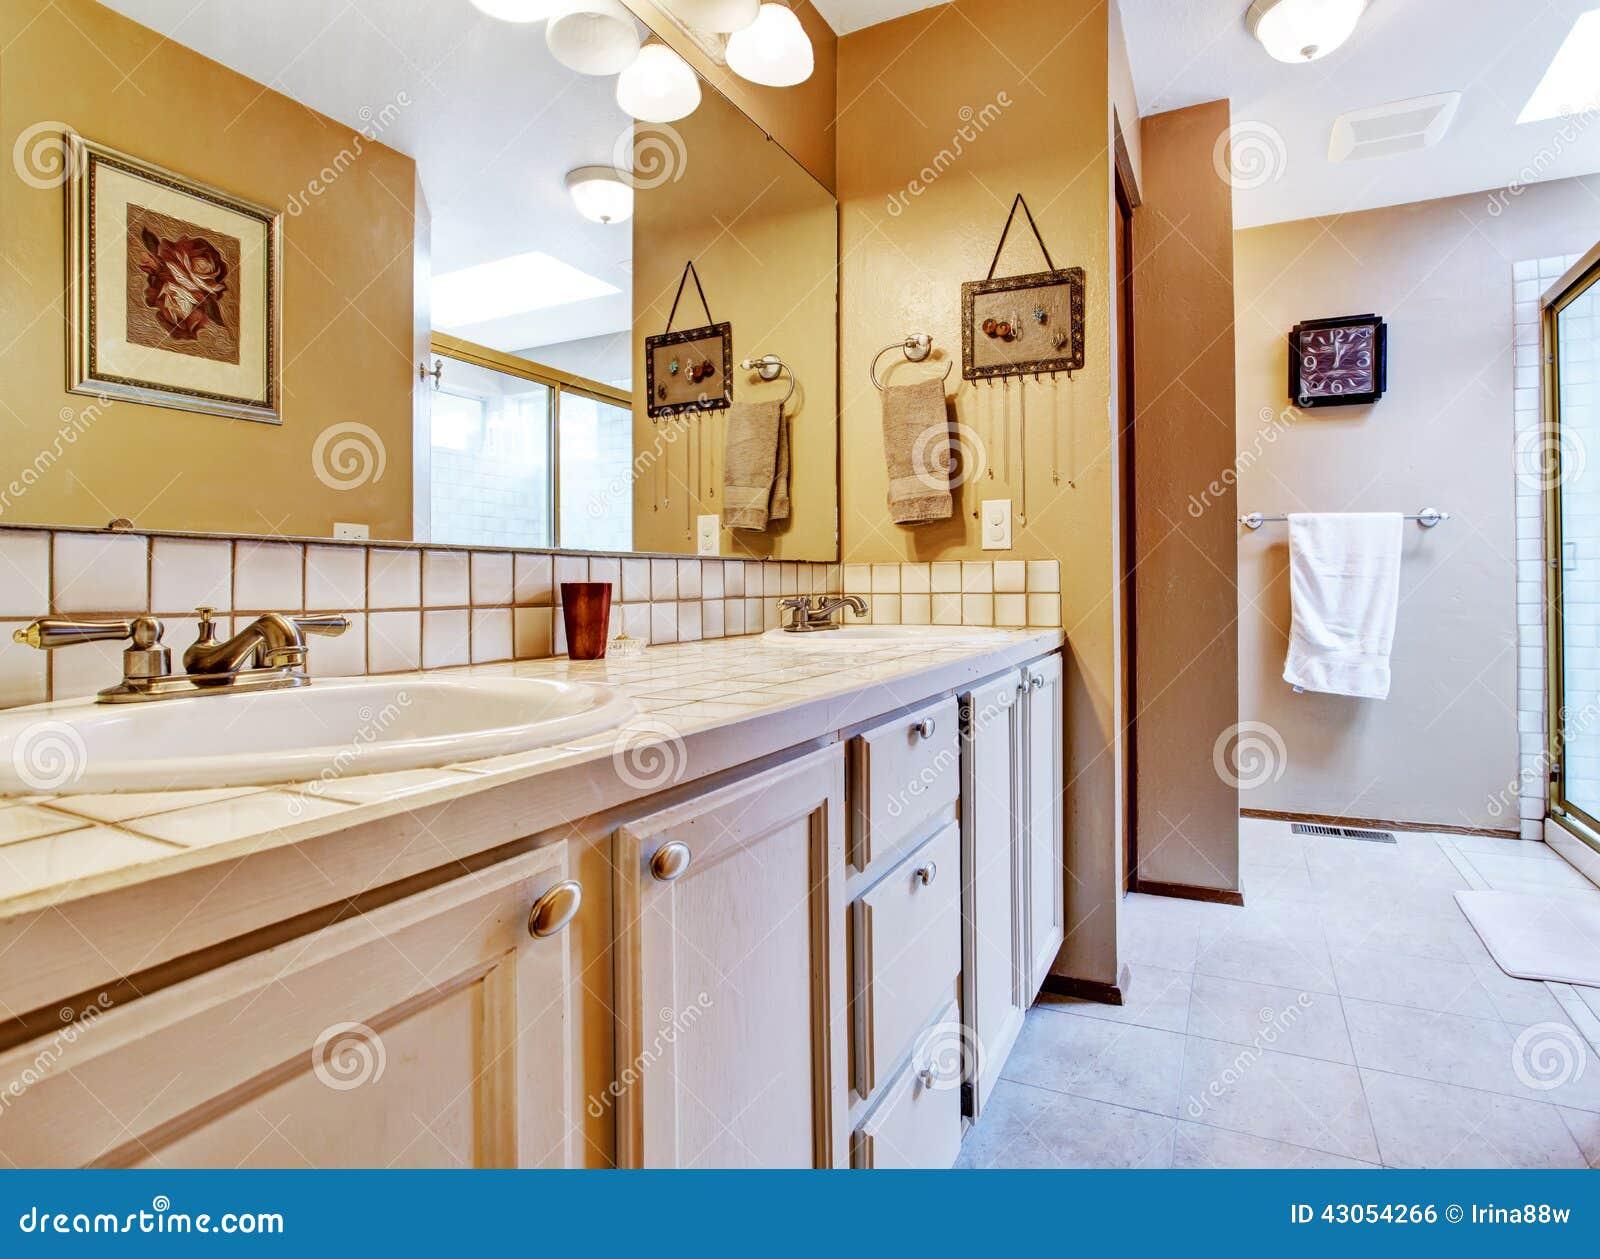 bathroom interior in old house view of bathroom vanity cabinet